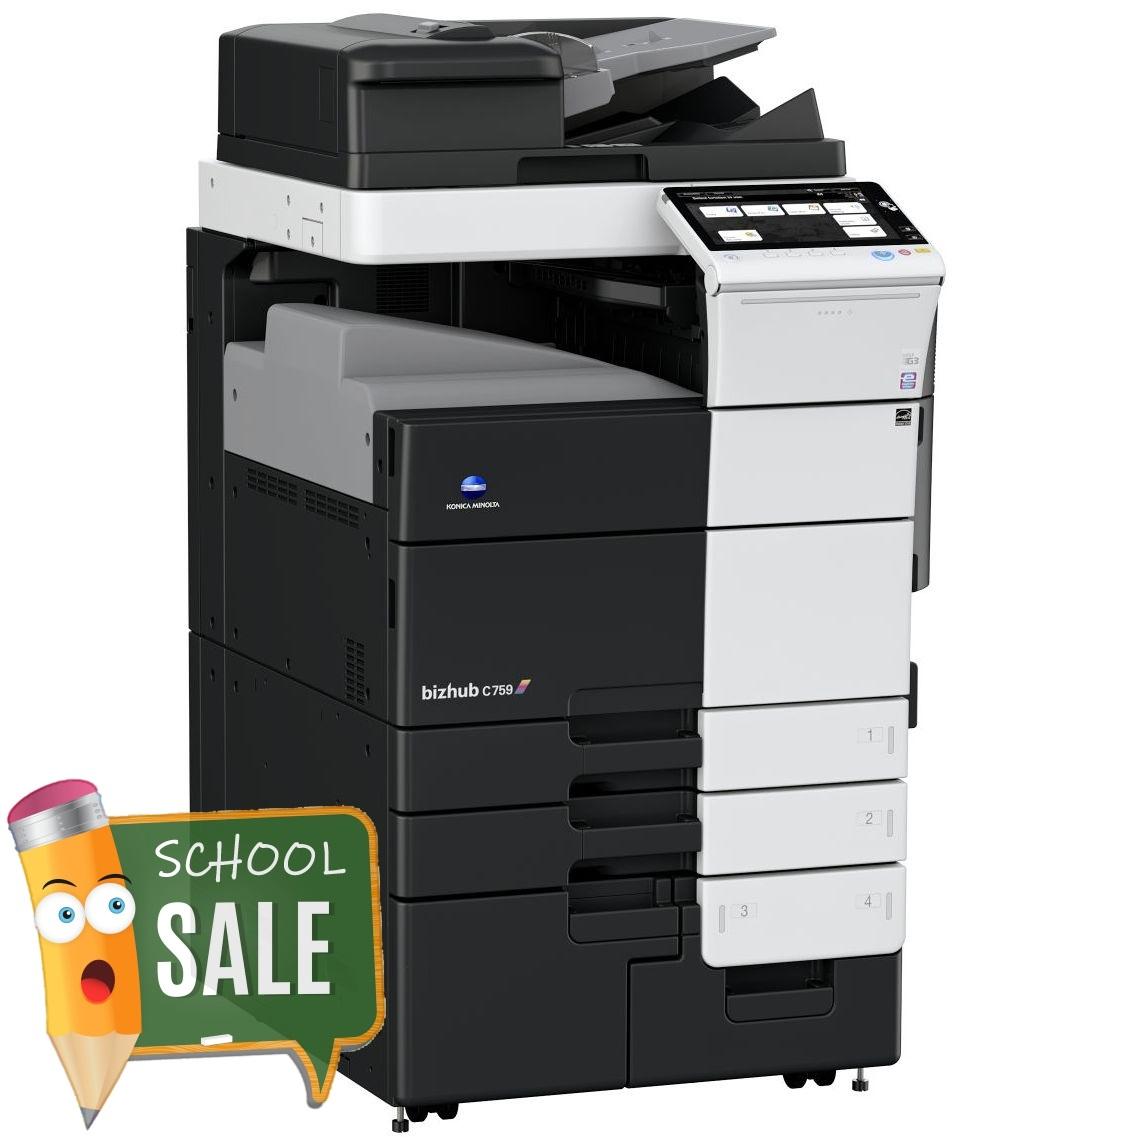 Konica Minolta Bizhub C759 OT-508 Colour Copier Printer Rental Price Offers